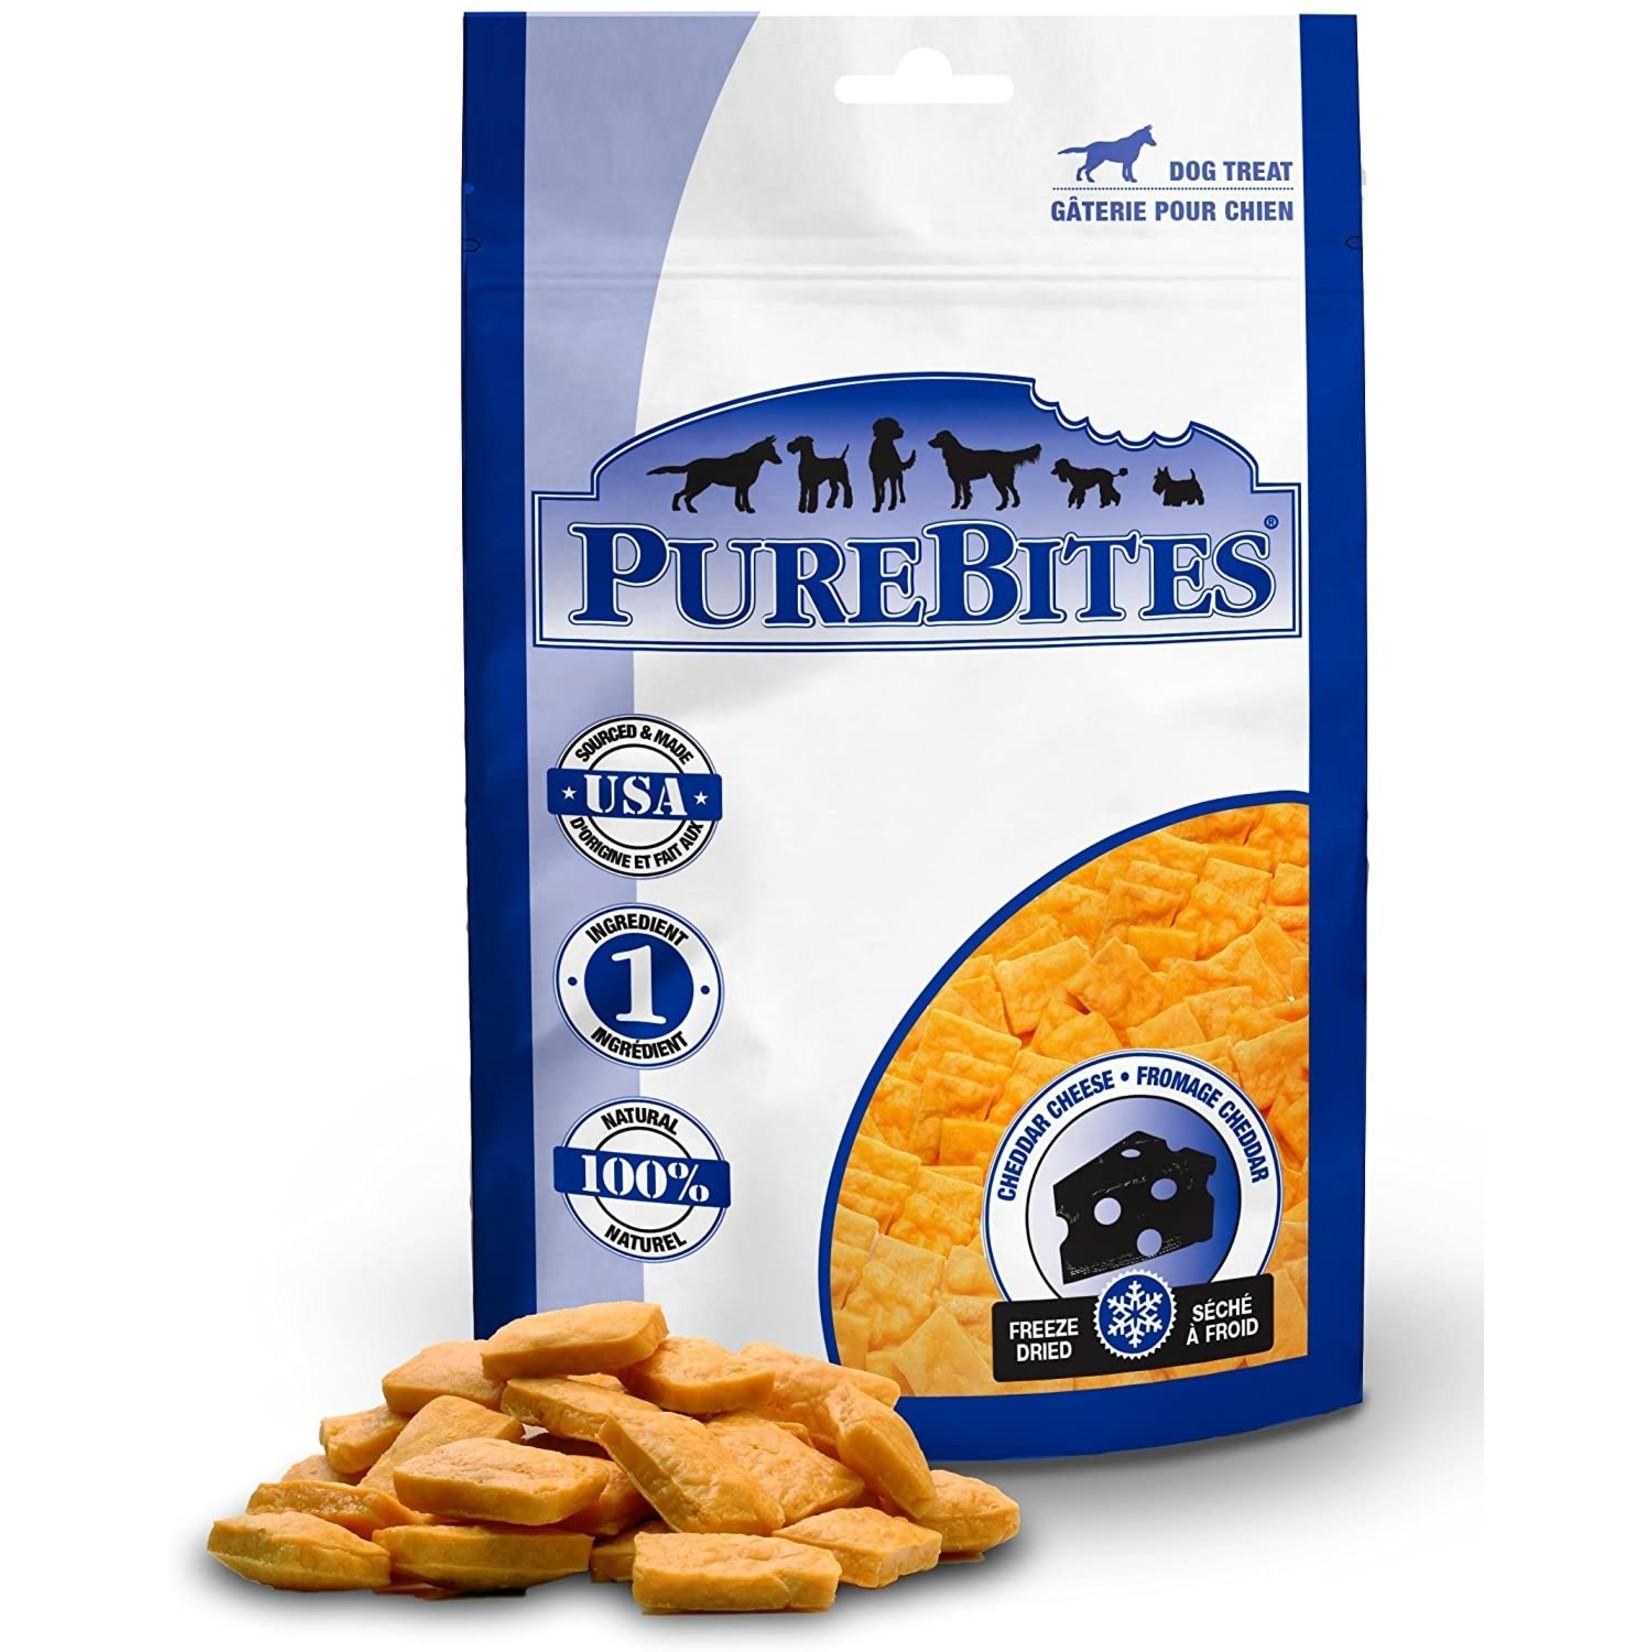 PureBites Purebites Cheddar Cheese Freeze Dried  Dog Treat 4.2oz